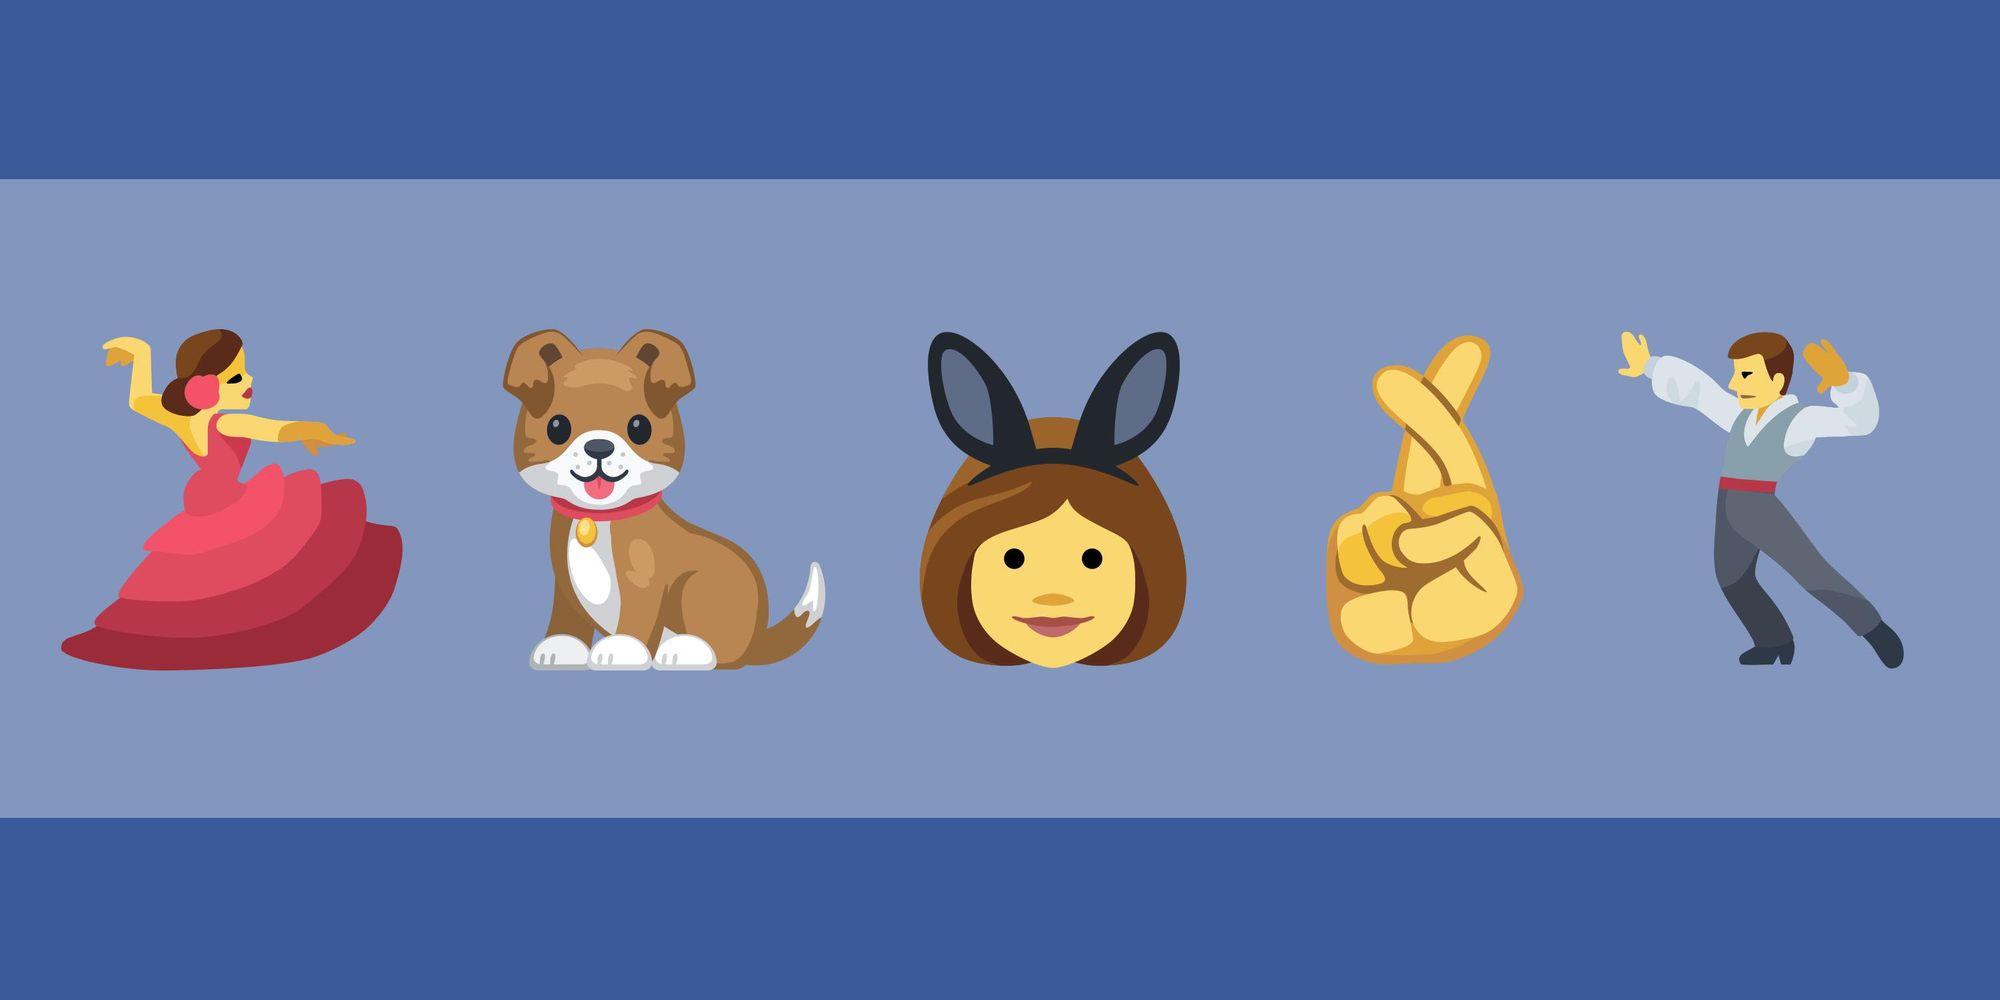 Facebook Completes Emoji Update